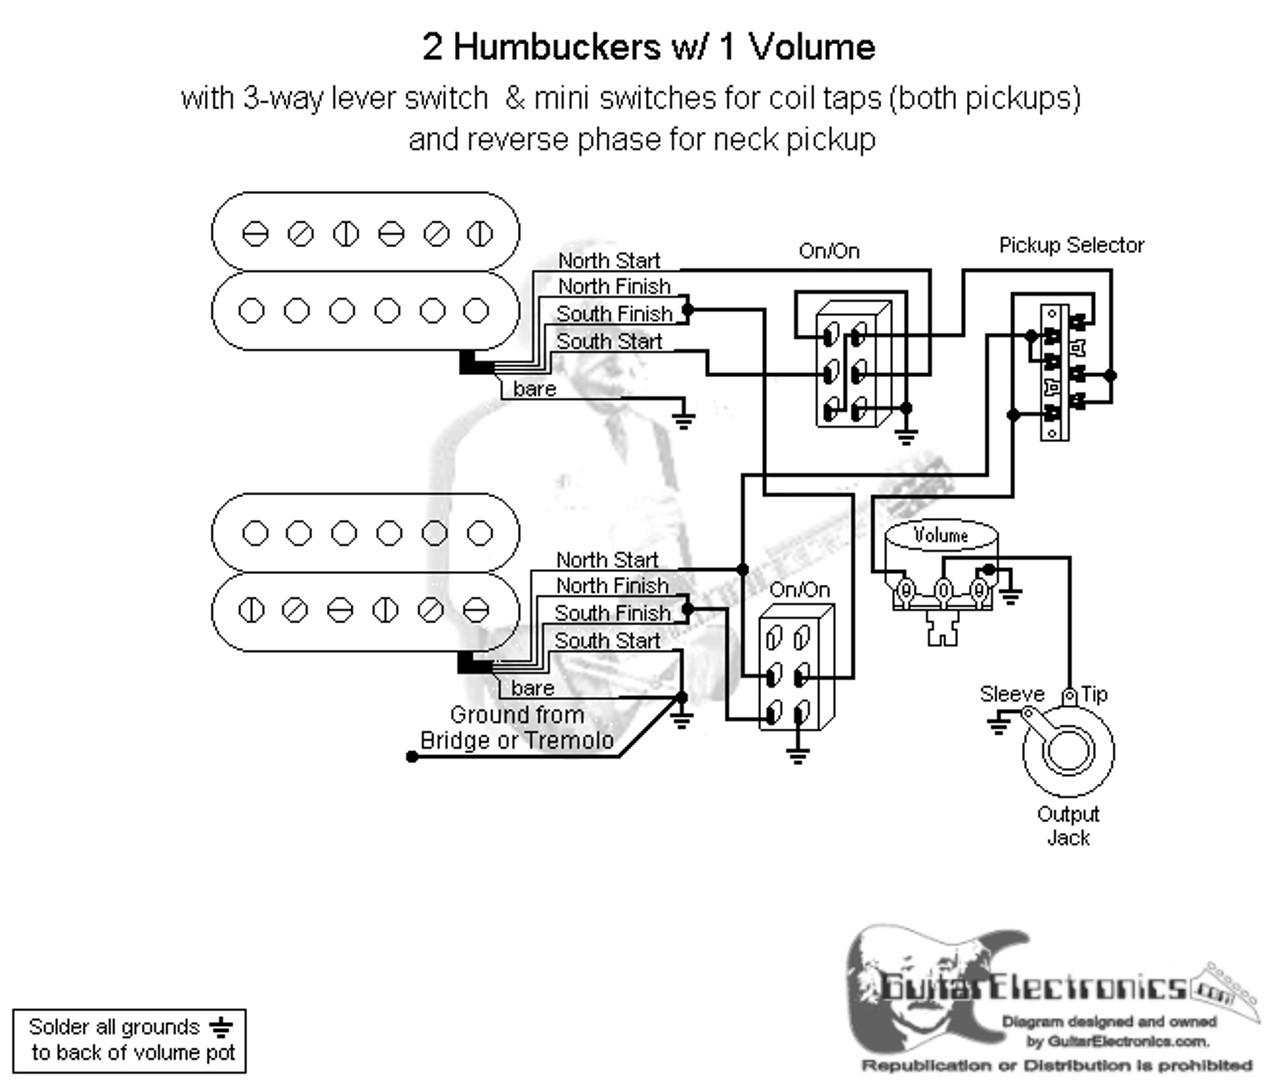 Humbucker Coil Tap Wiring Diagram from cdn11.bigcommerce.com